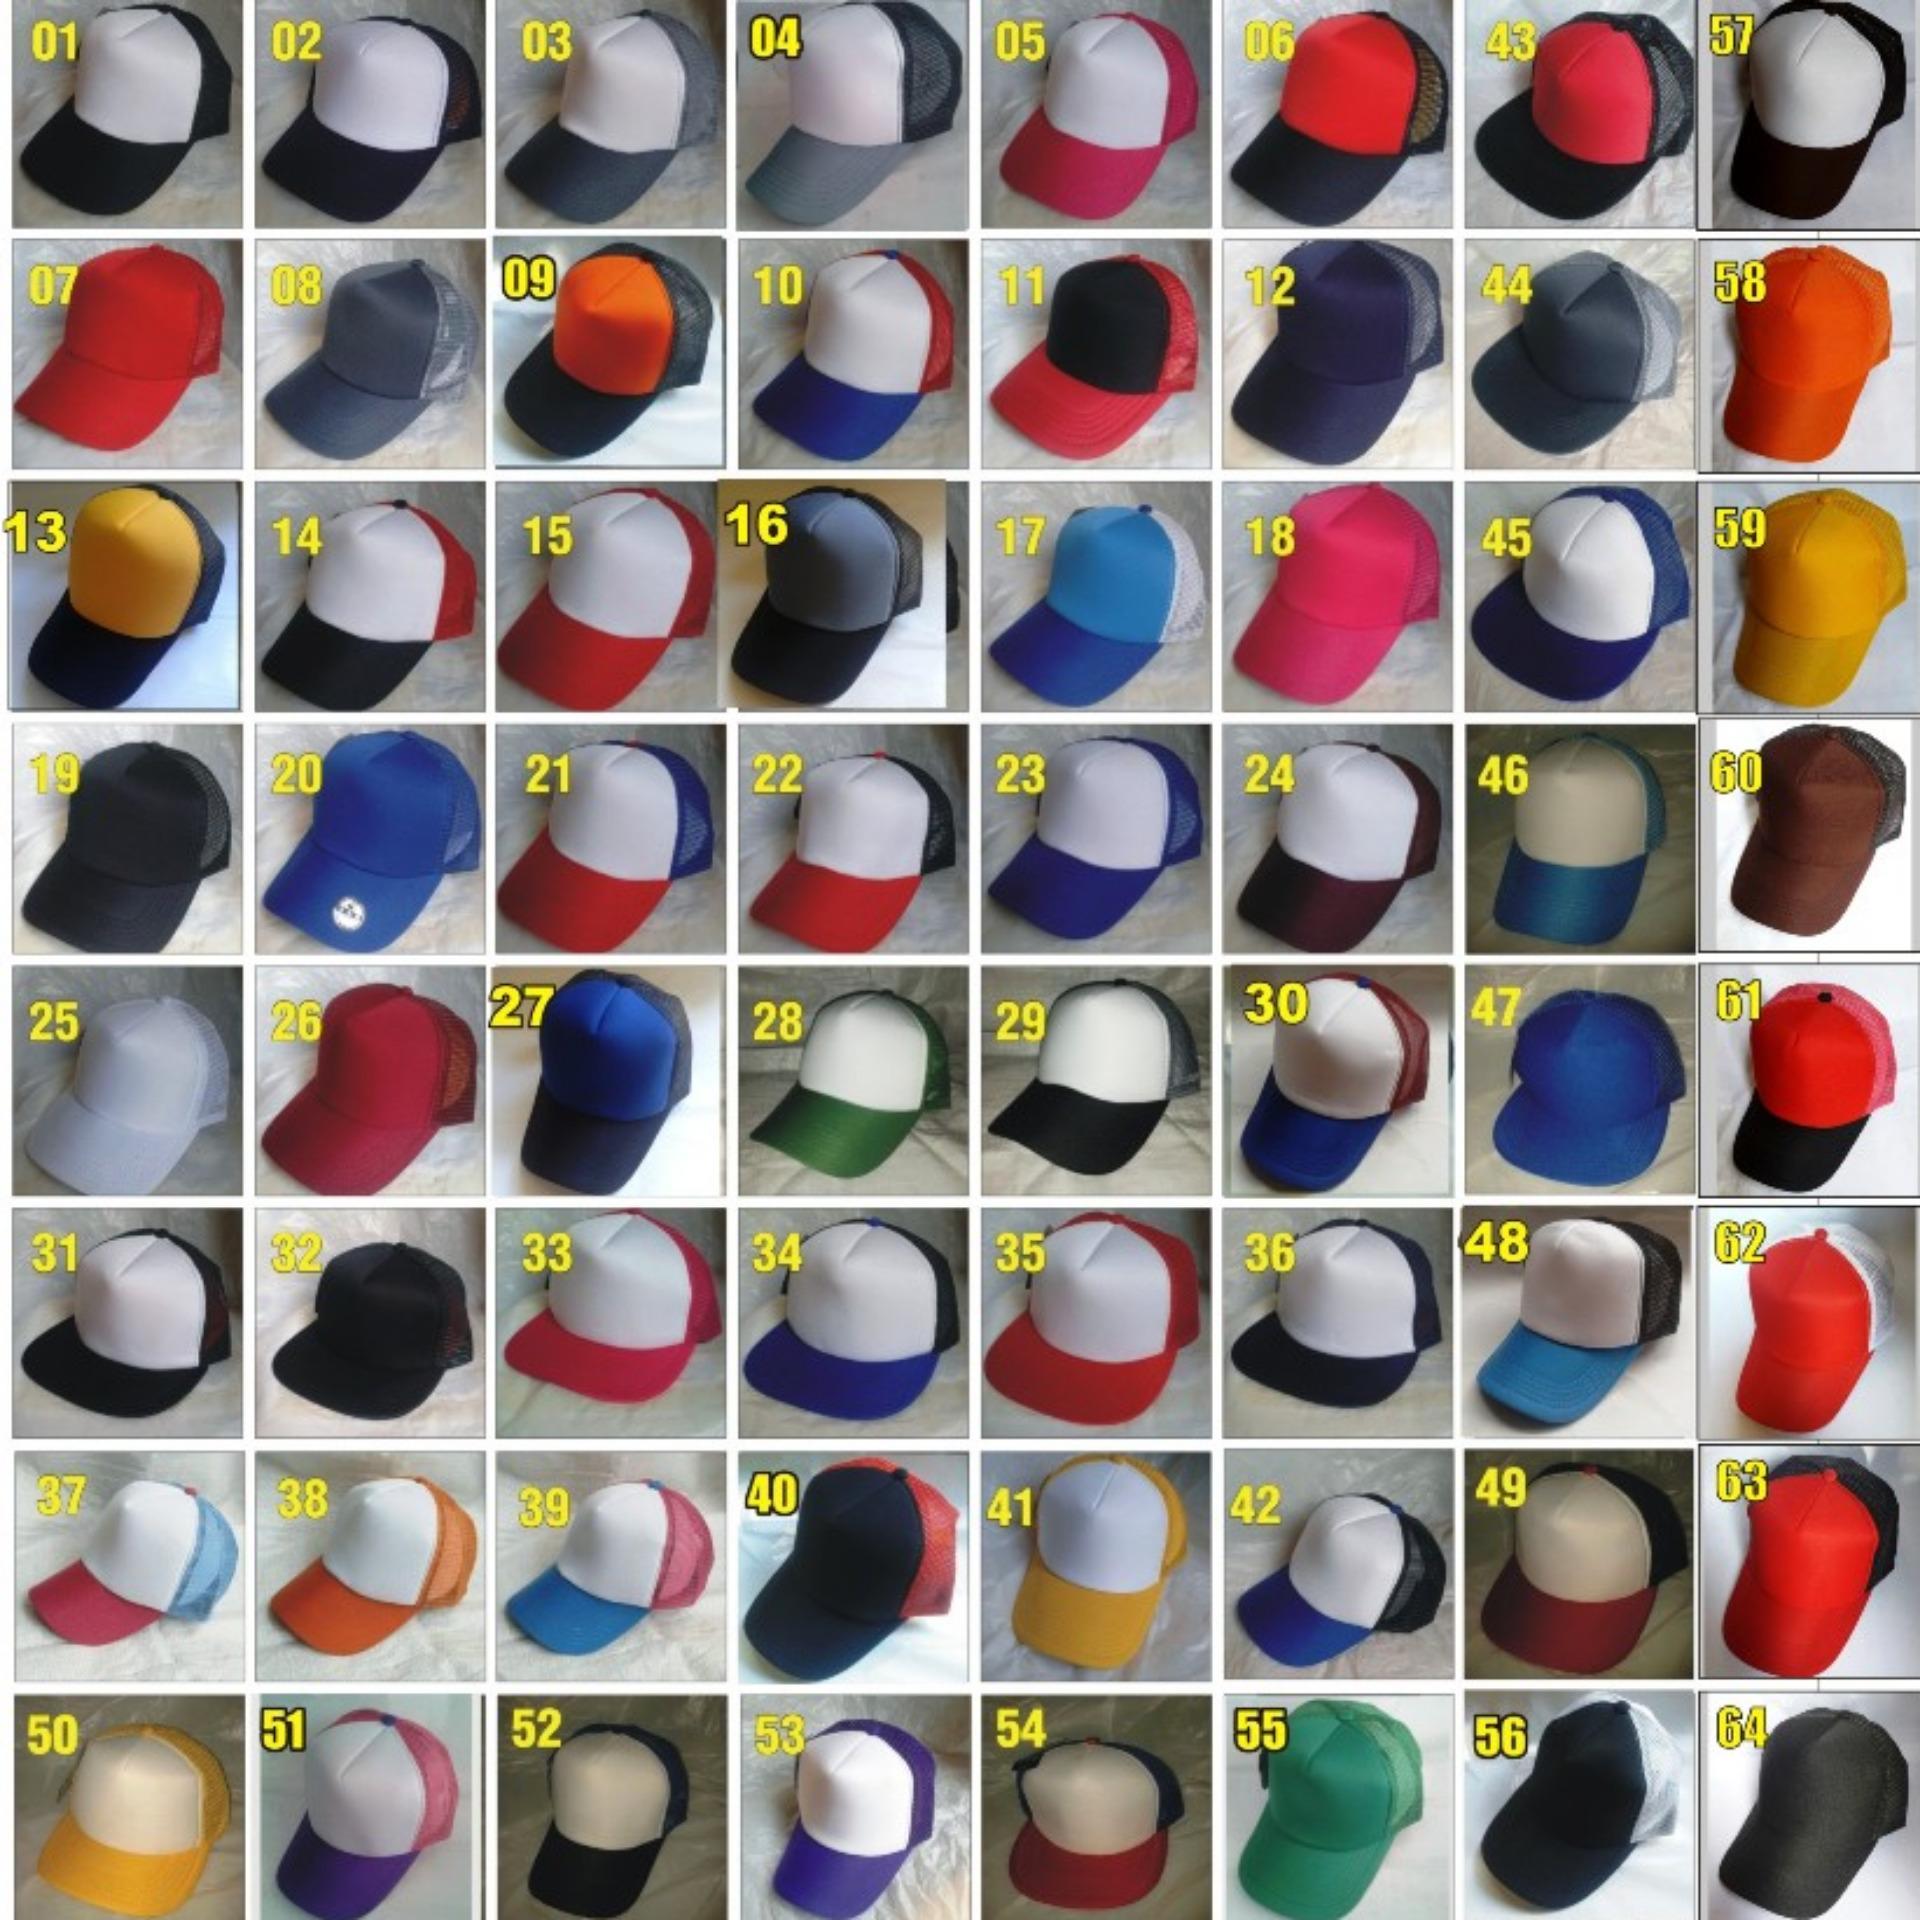 Topi Trucker Polos / Topi Polos / Topi Jaring / Topi Murah / Grosir Topi / Topi Basball / Topi Adidas / Topi Jaring / Dristributor Topi